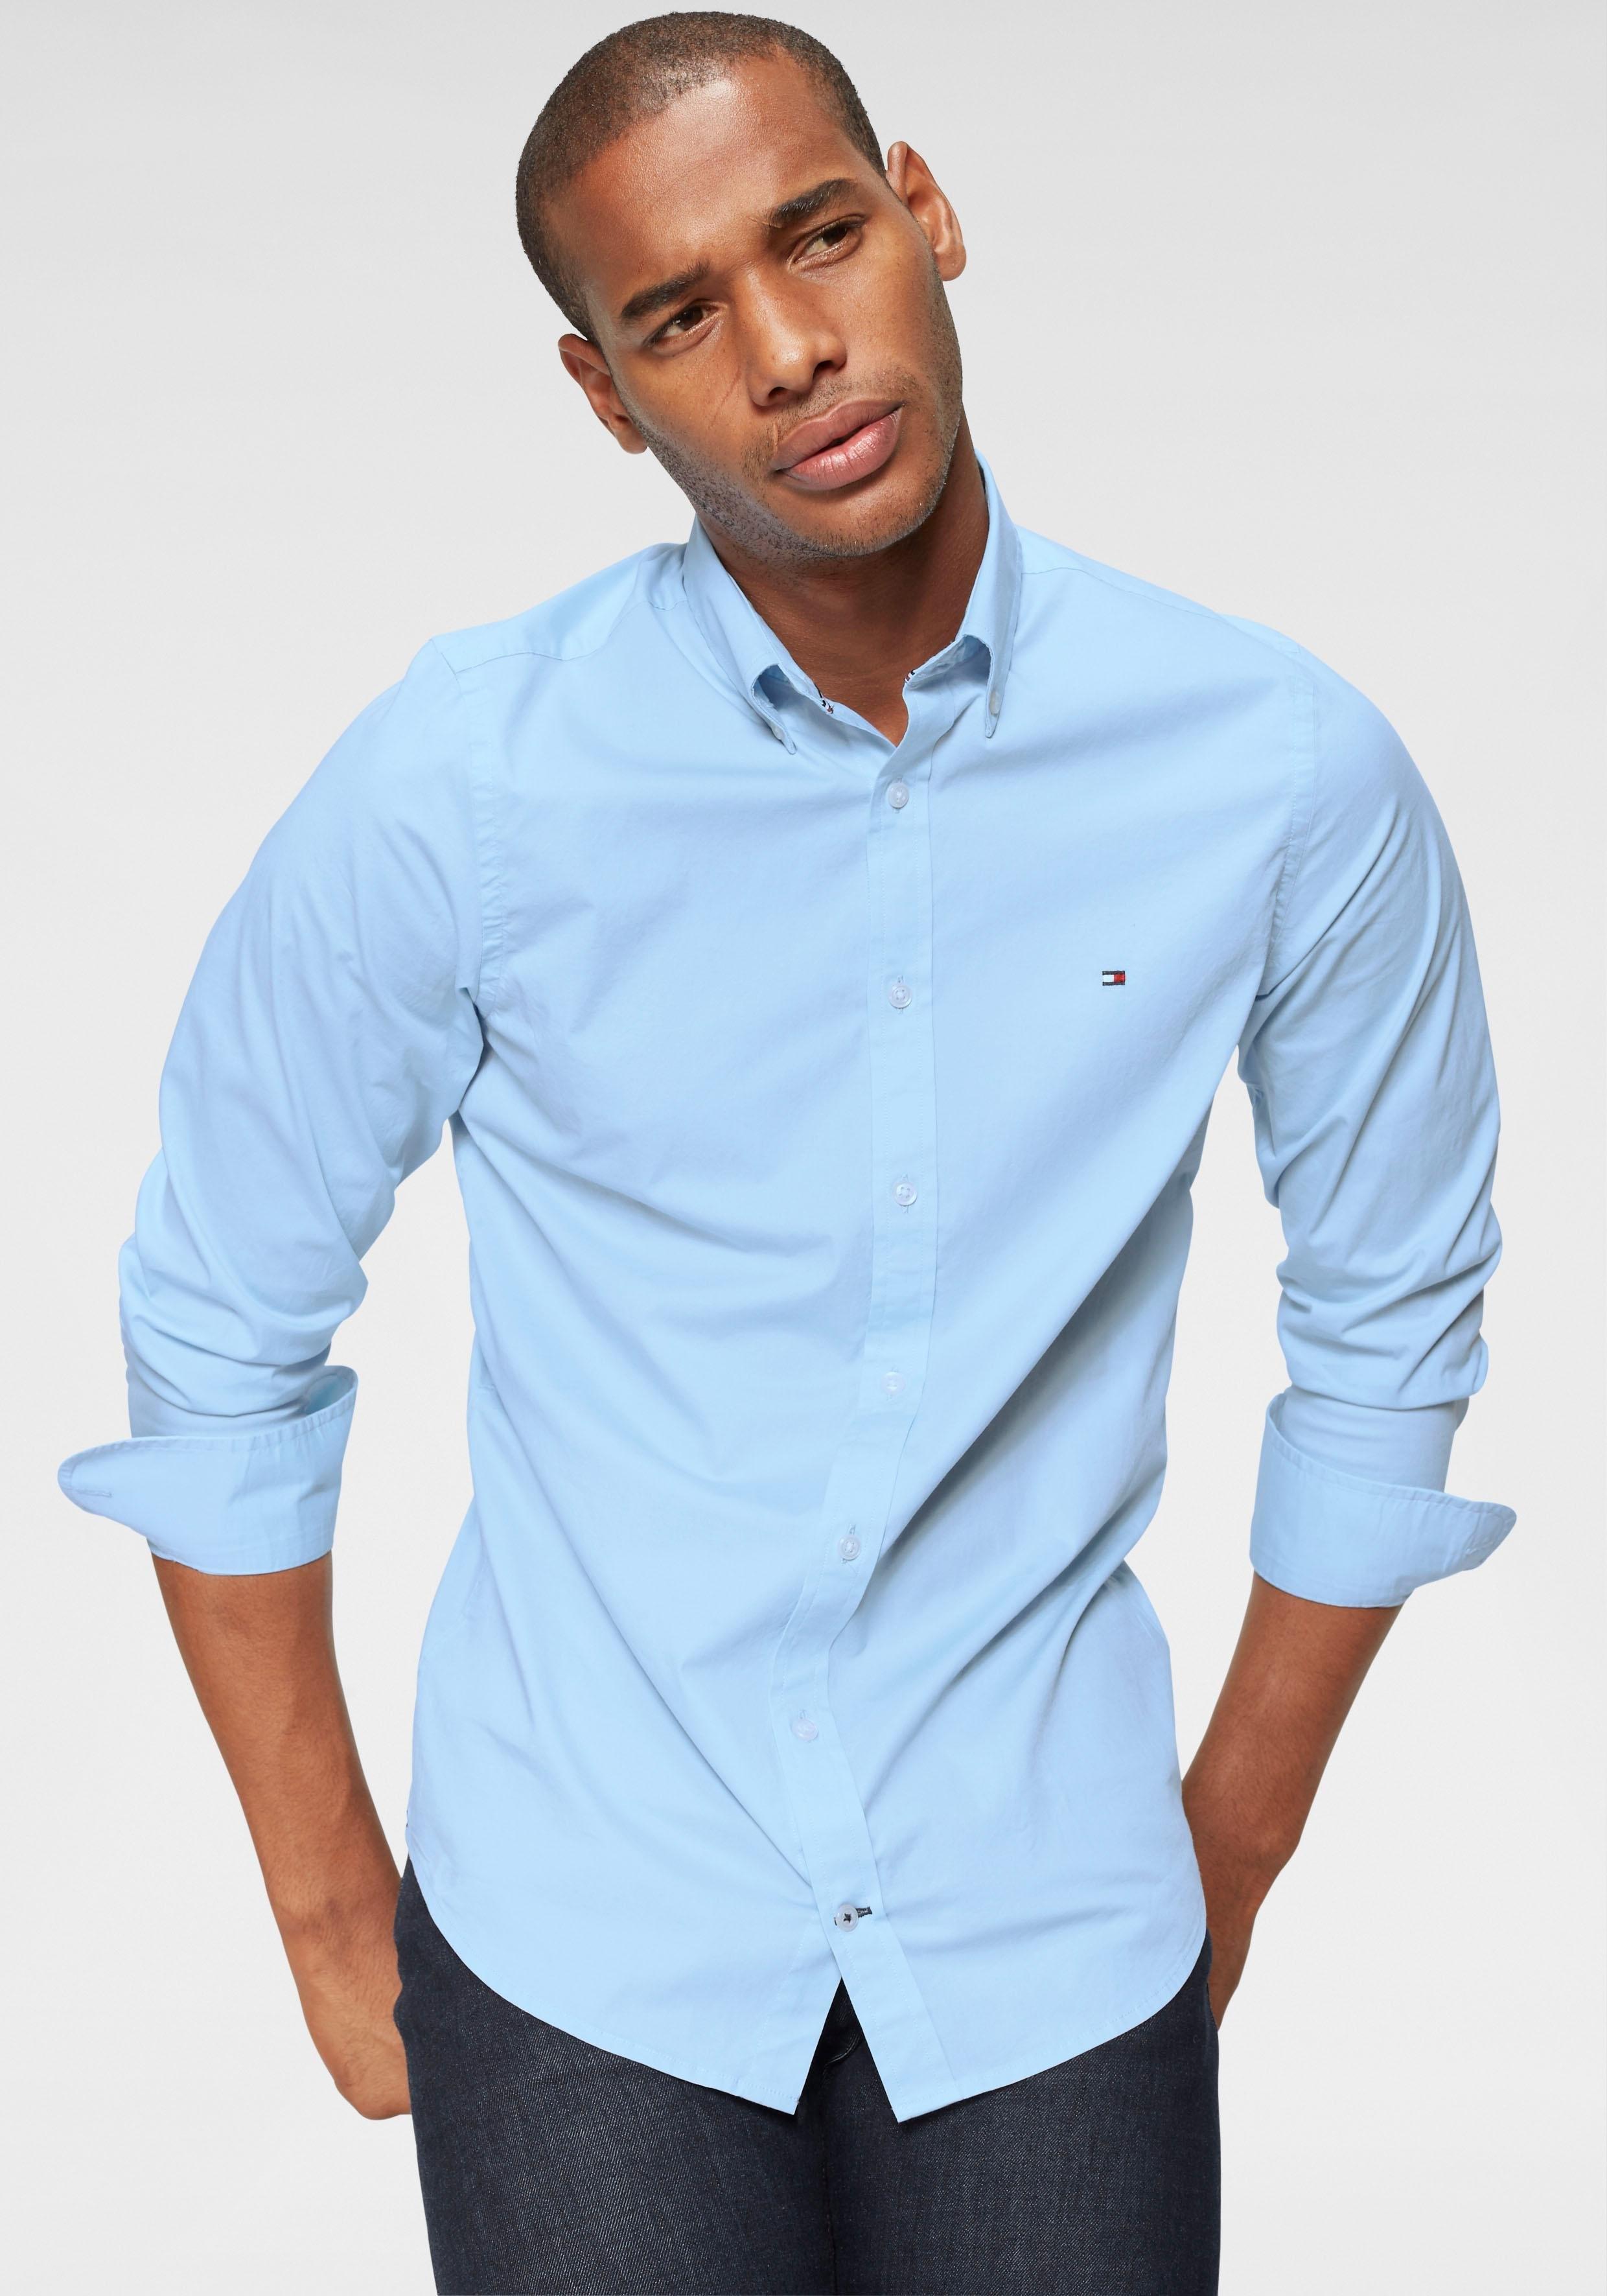 TOMMY HILFIGER overhemd met lange mouwen »CORE STRETCH SLIM POPLIN SHIRT« bij OTTO online kopen